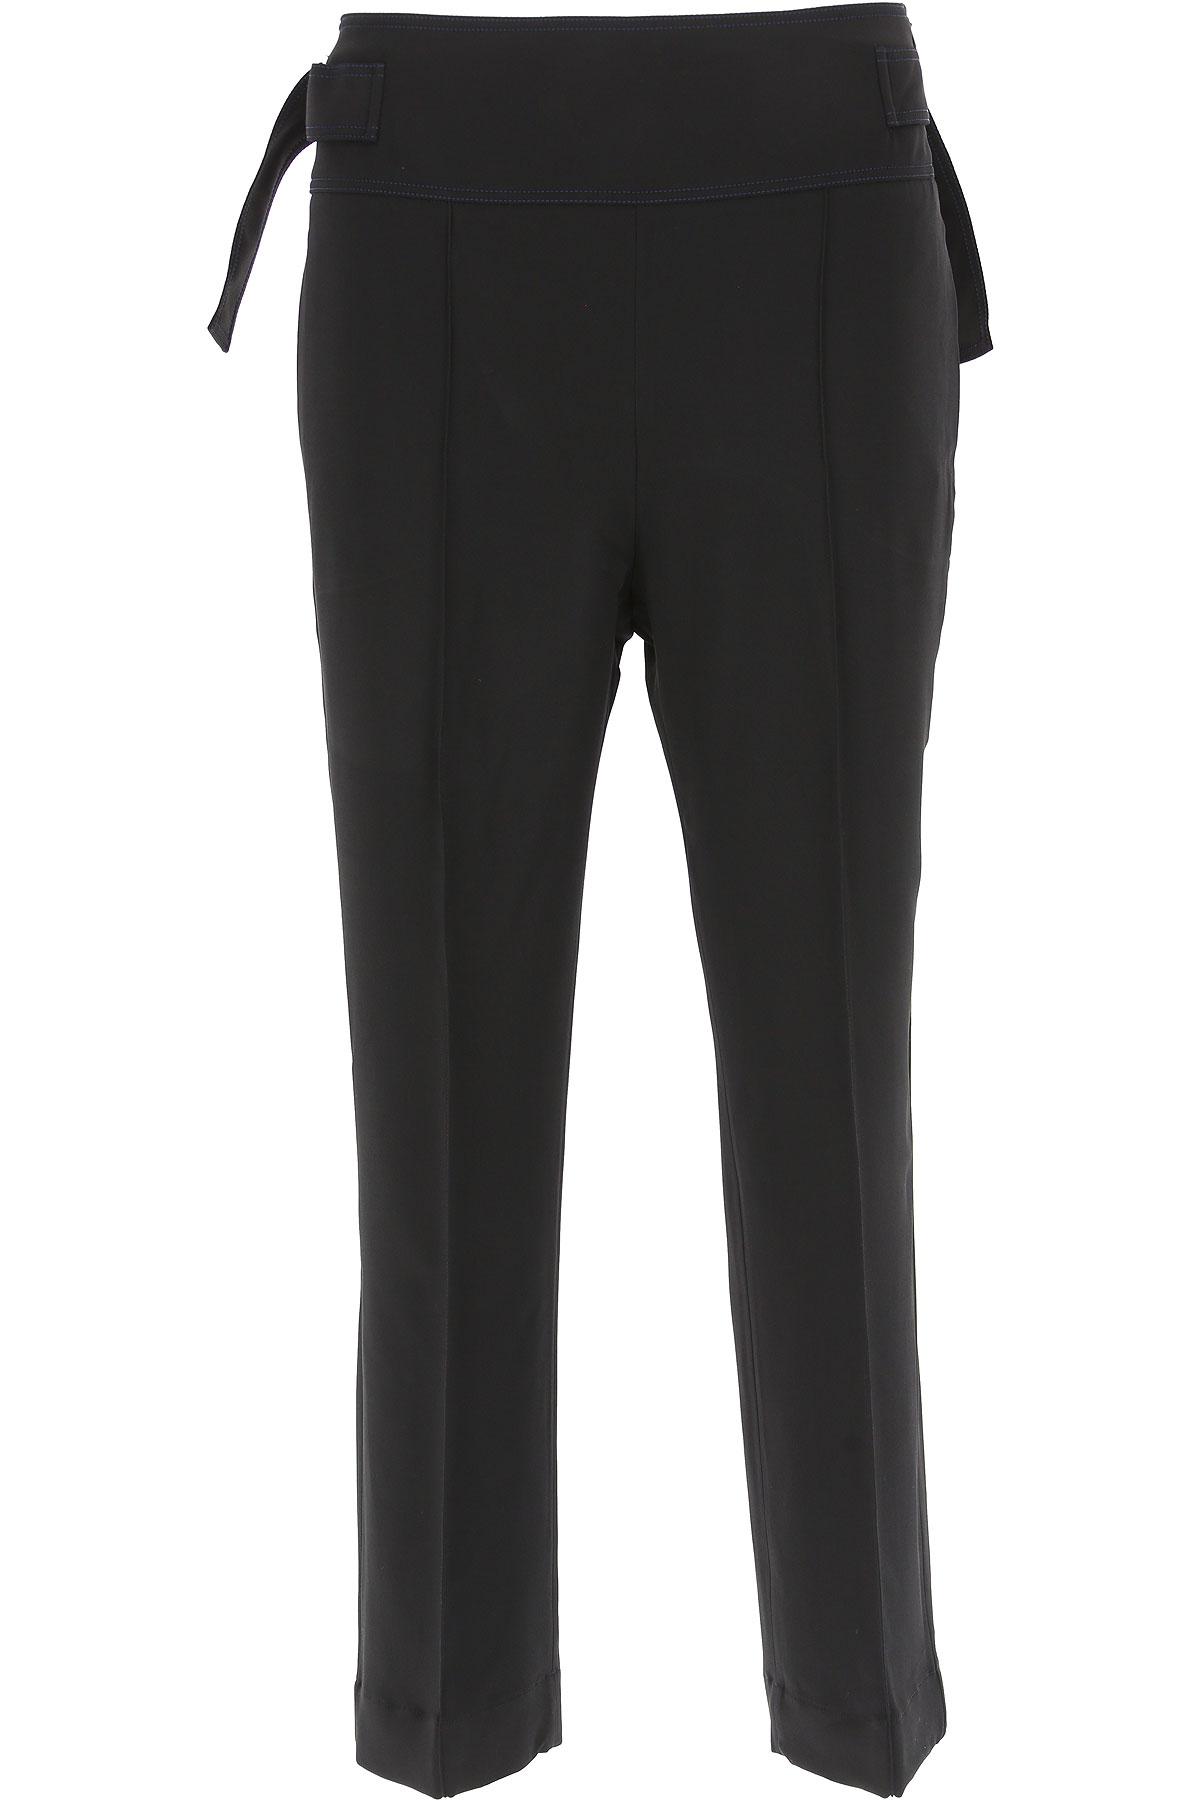 Image of SportMax Pants for Women, Black, viscosa, 2017, 24 26 28